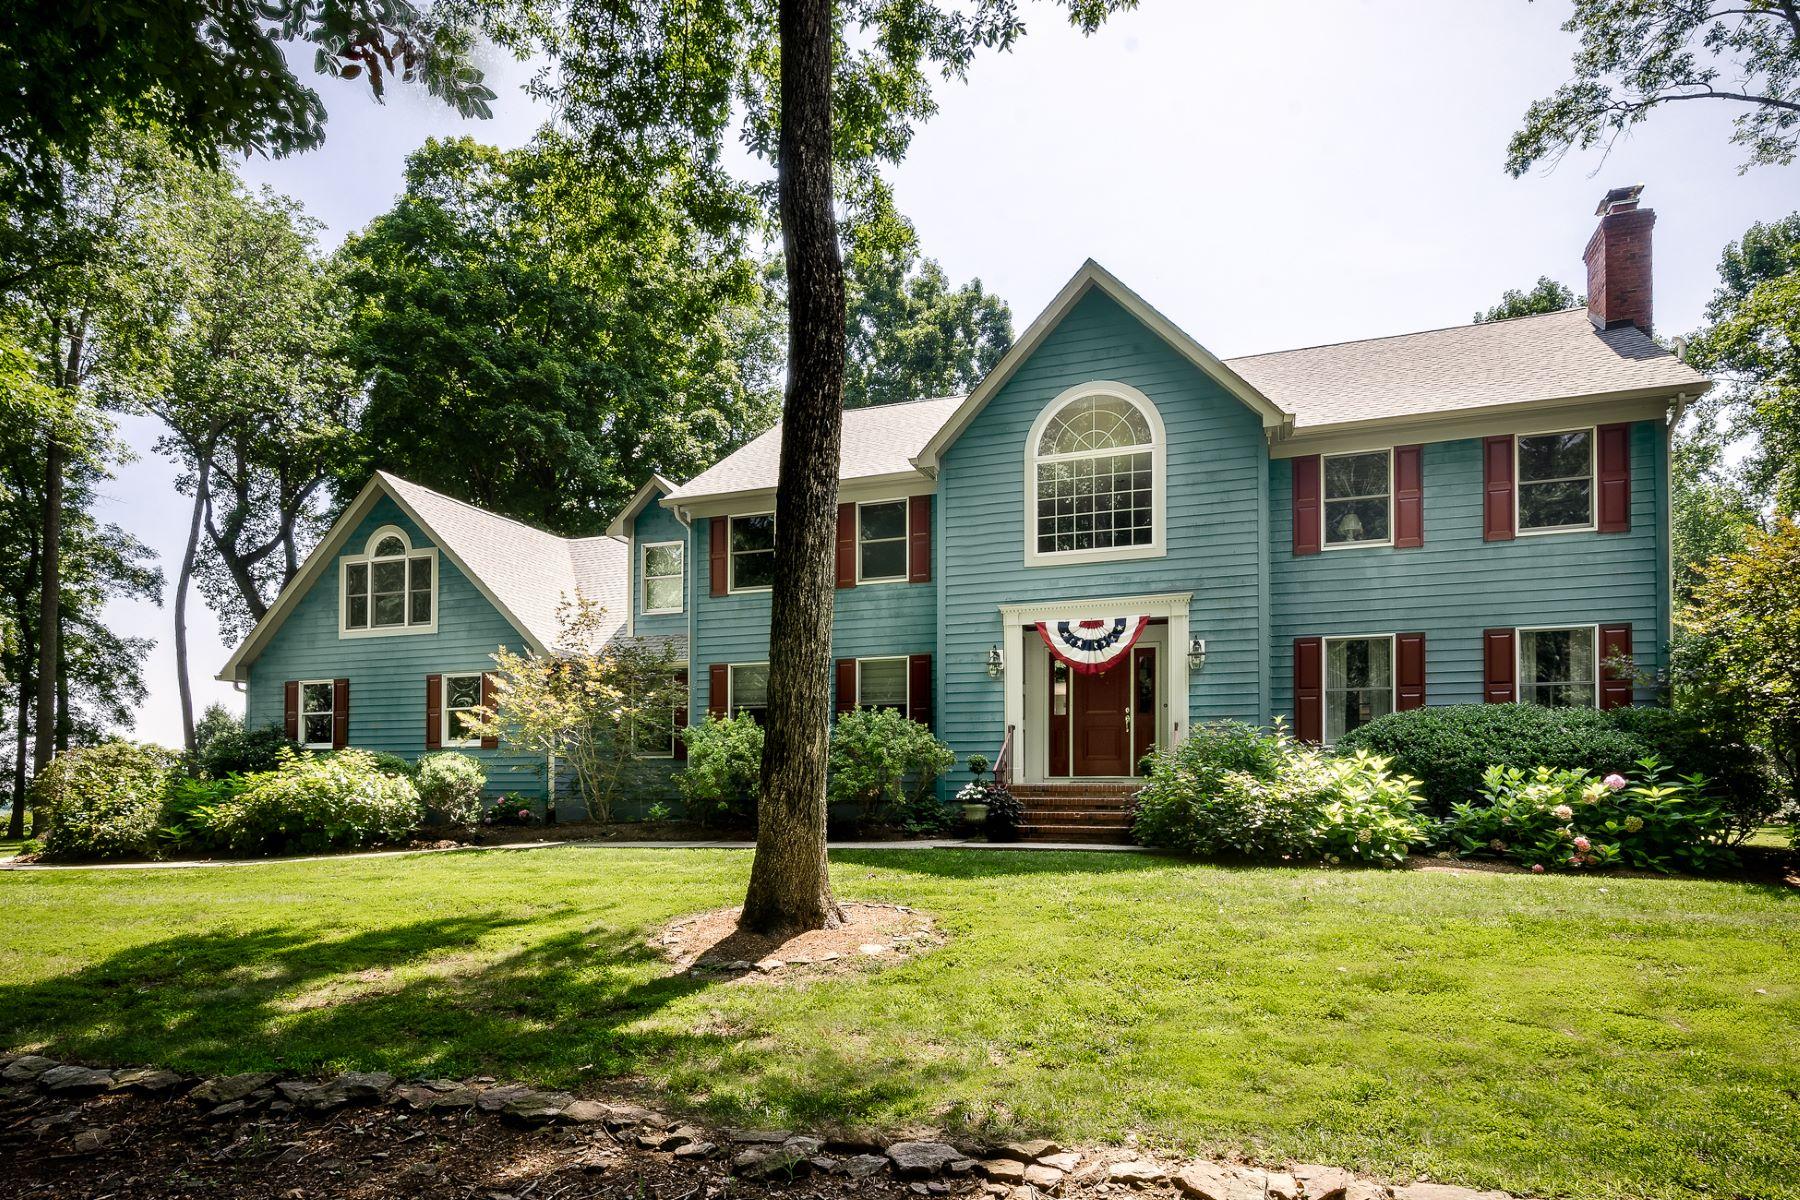 Tek Ailelik Ev için Satış at Quiet location with stunning views. 32 Harbourton Woodsville Road, Pennington, New Jersey 08534 Amerika Birleşik DevletleriIn/Etrafında: Hopewell Township